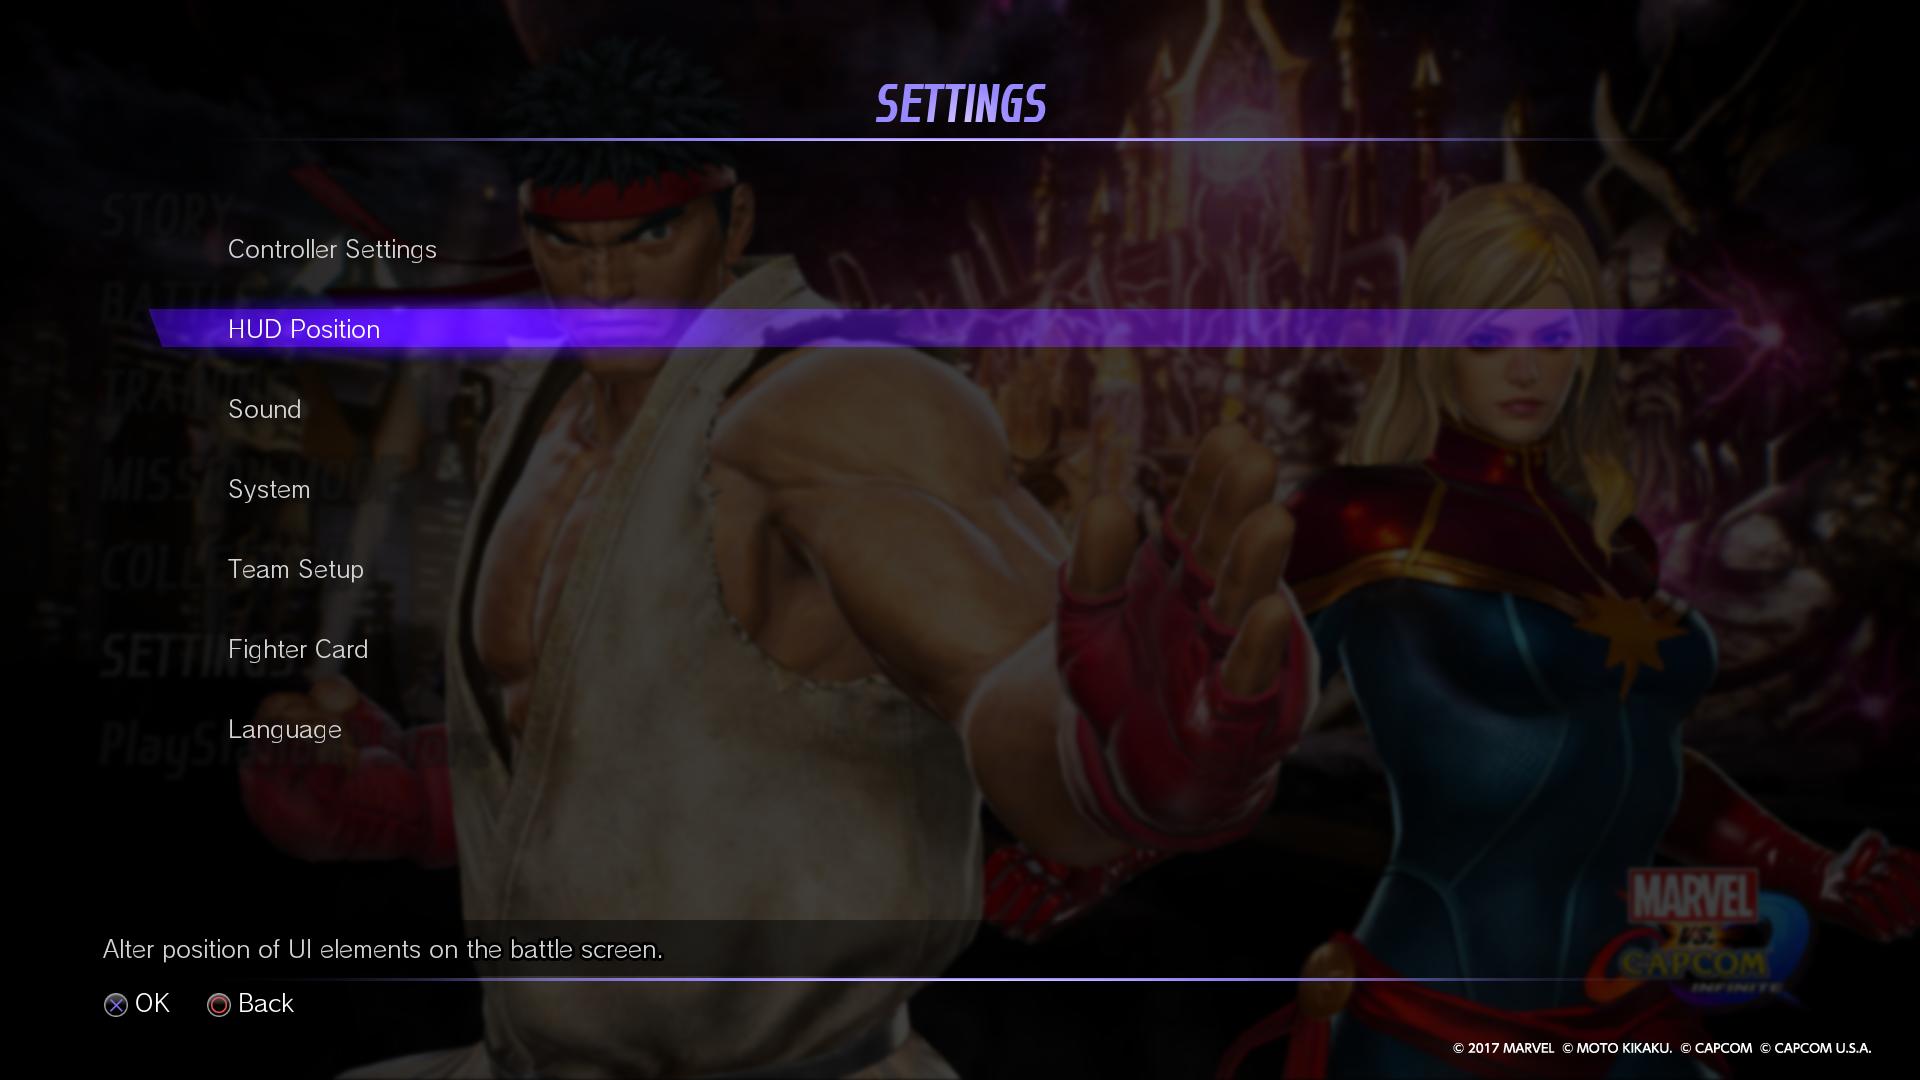 Marvel Vs Capcom Infinite Official Web Manual Settings